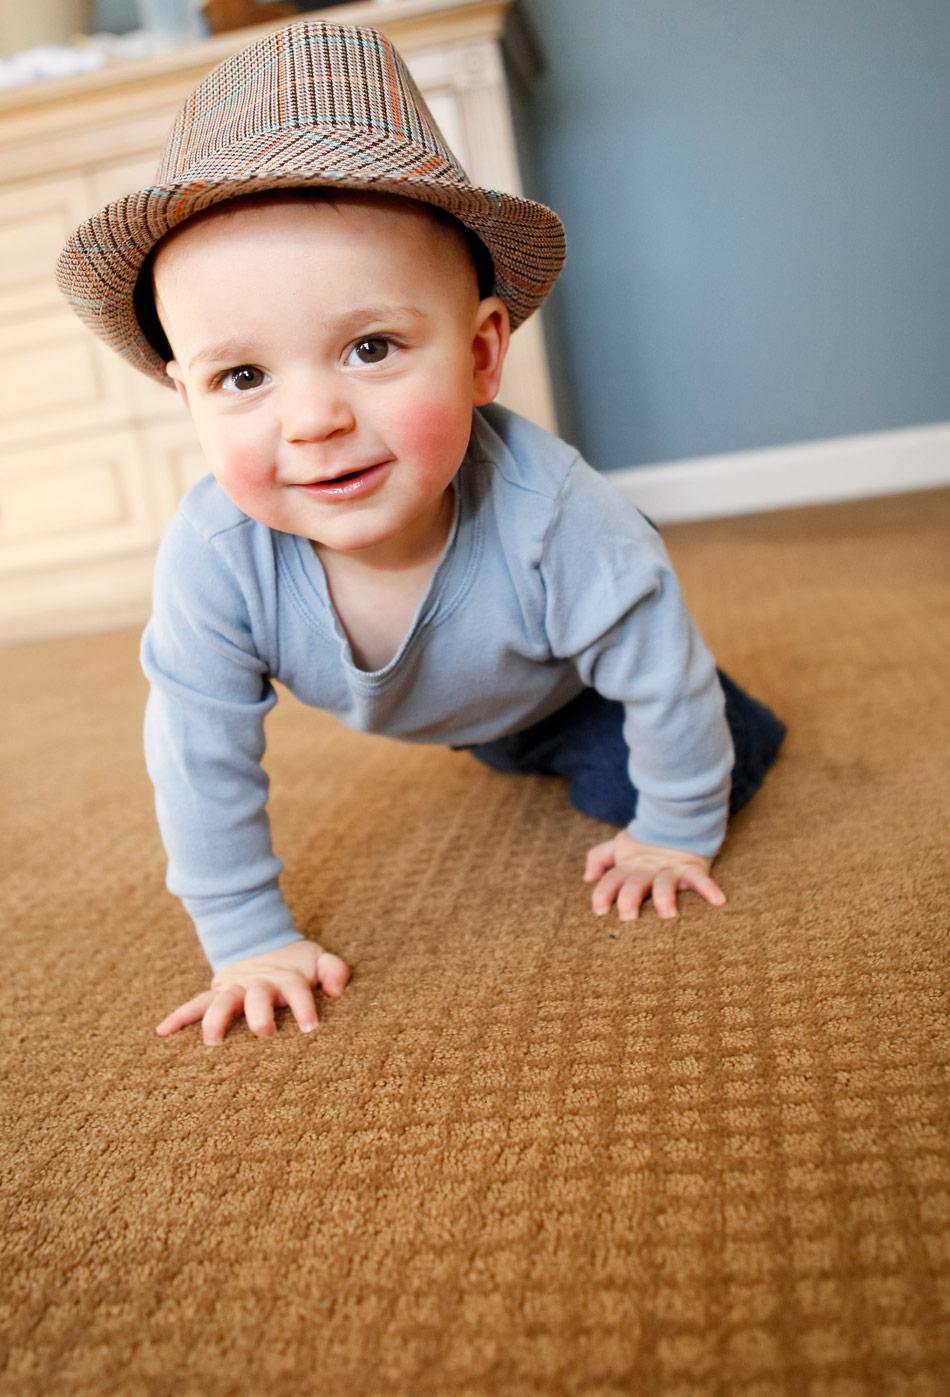 barrington-family-portraits-baby-ruthie-hauge-photography.jpg